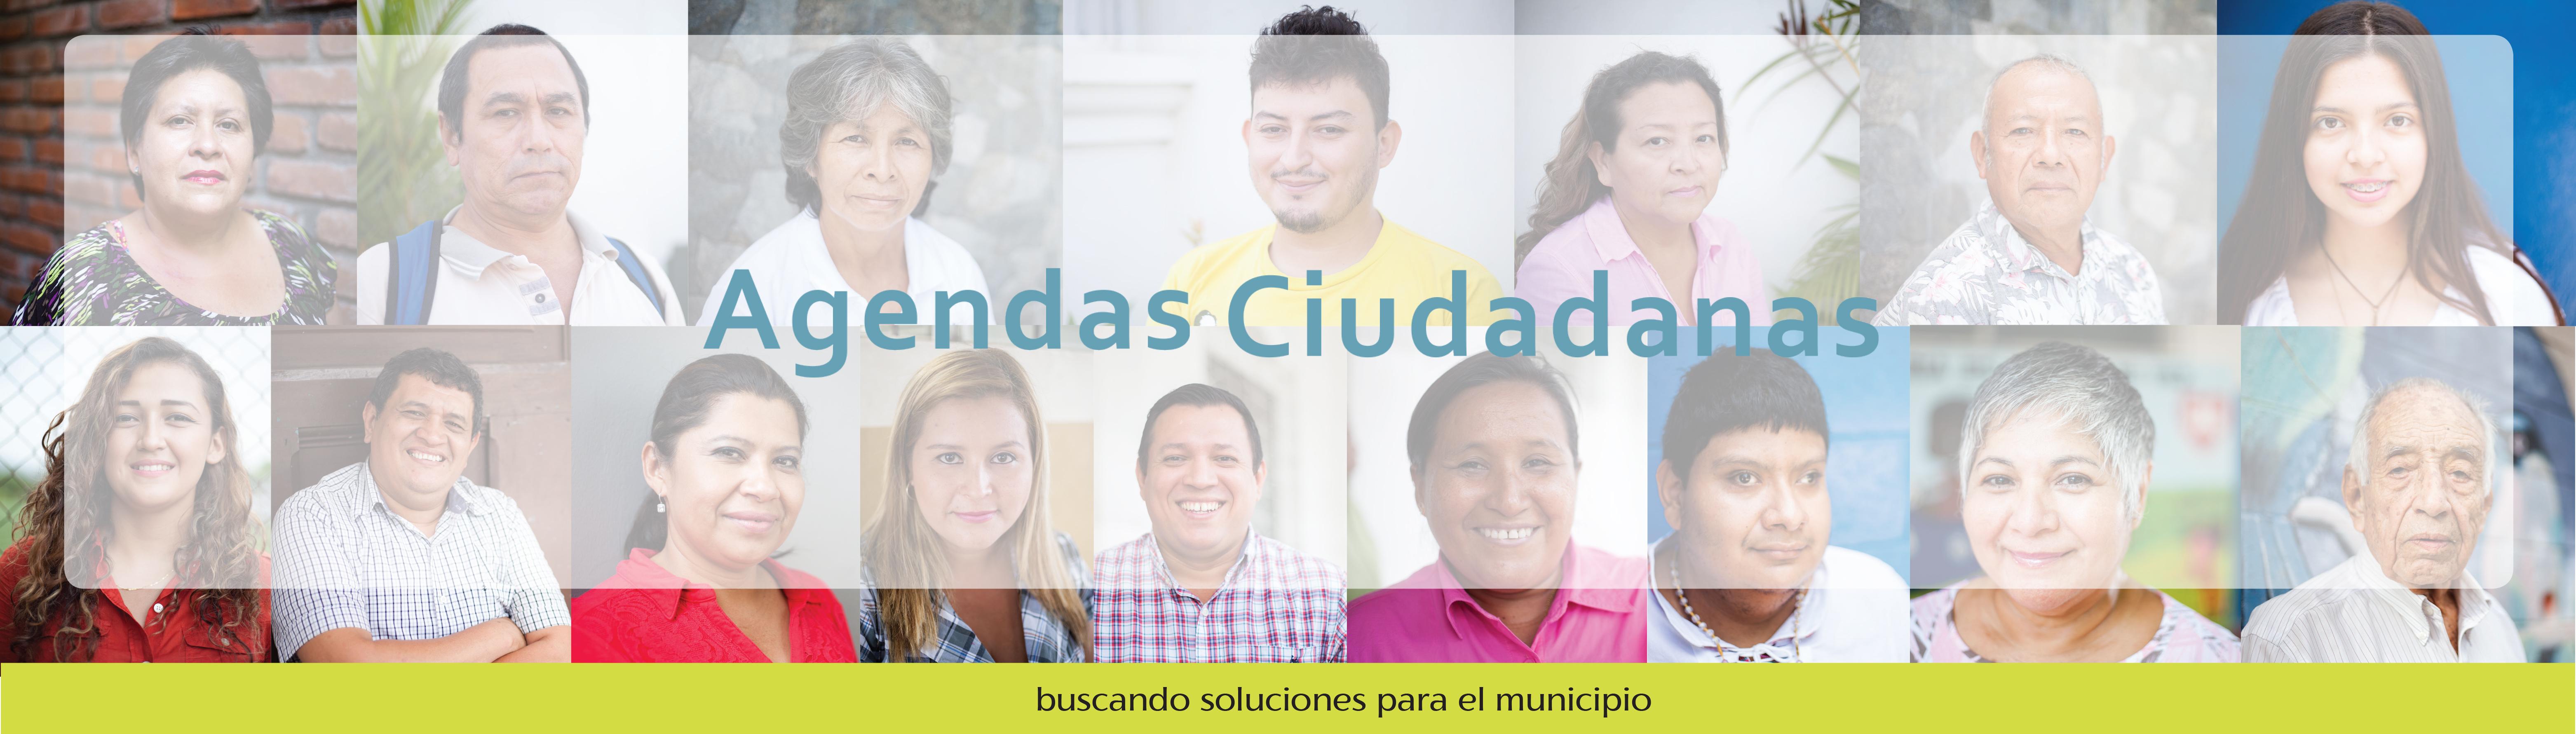 Banner_web_agendas_ciudadanas-4.jpg